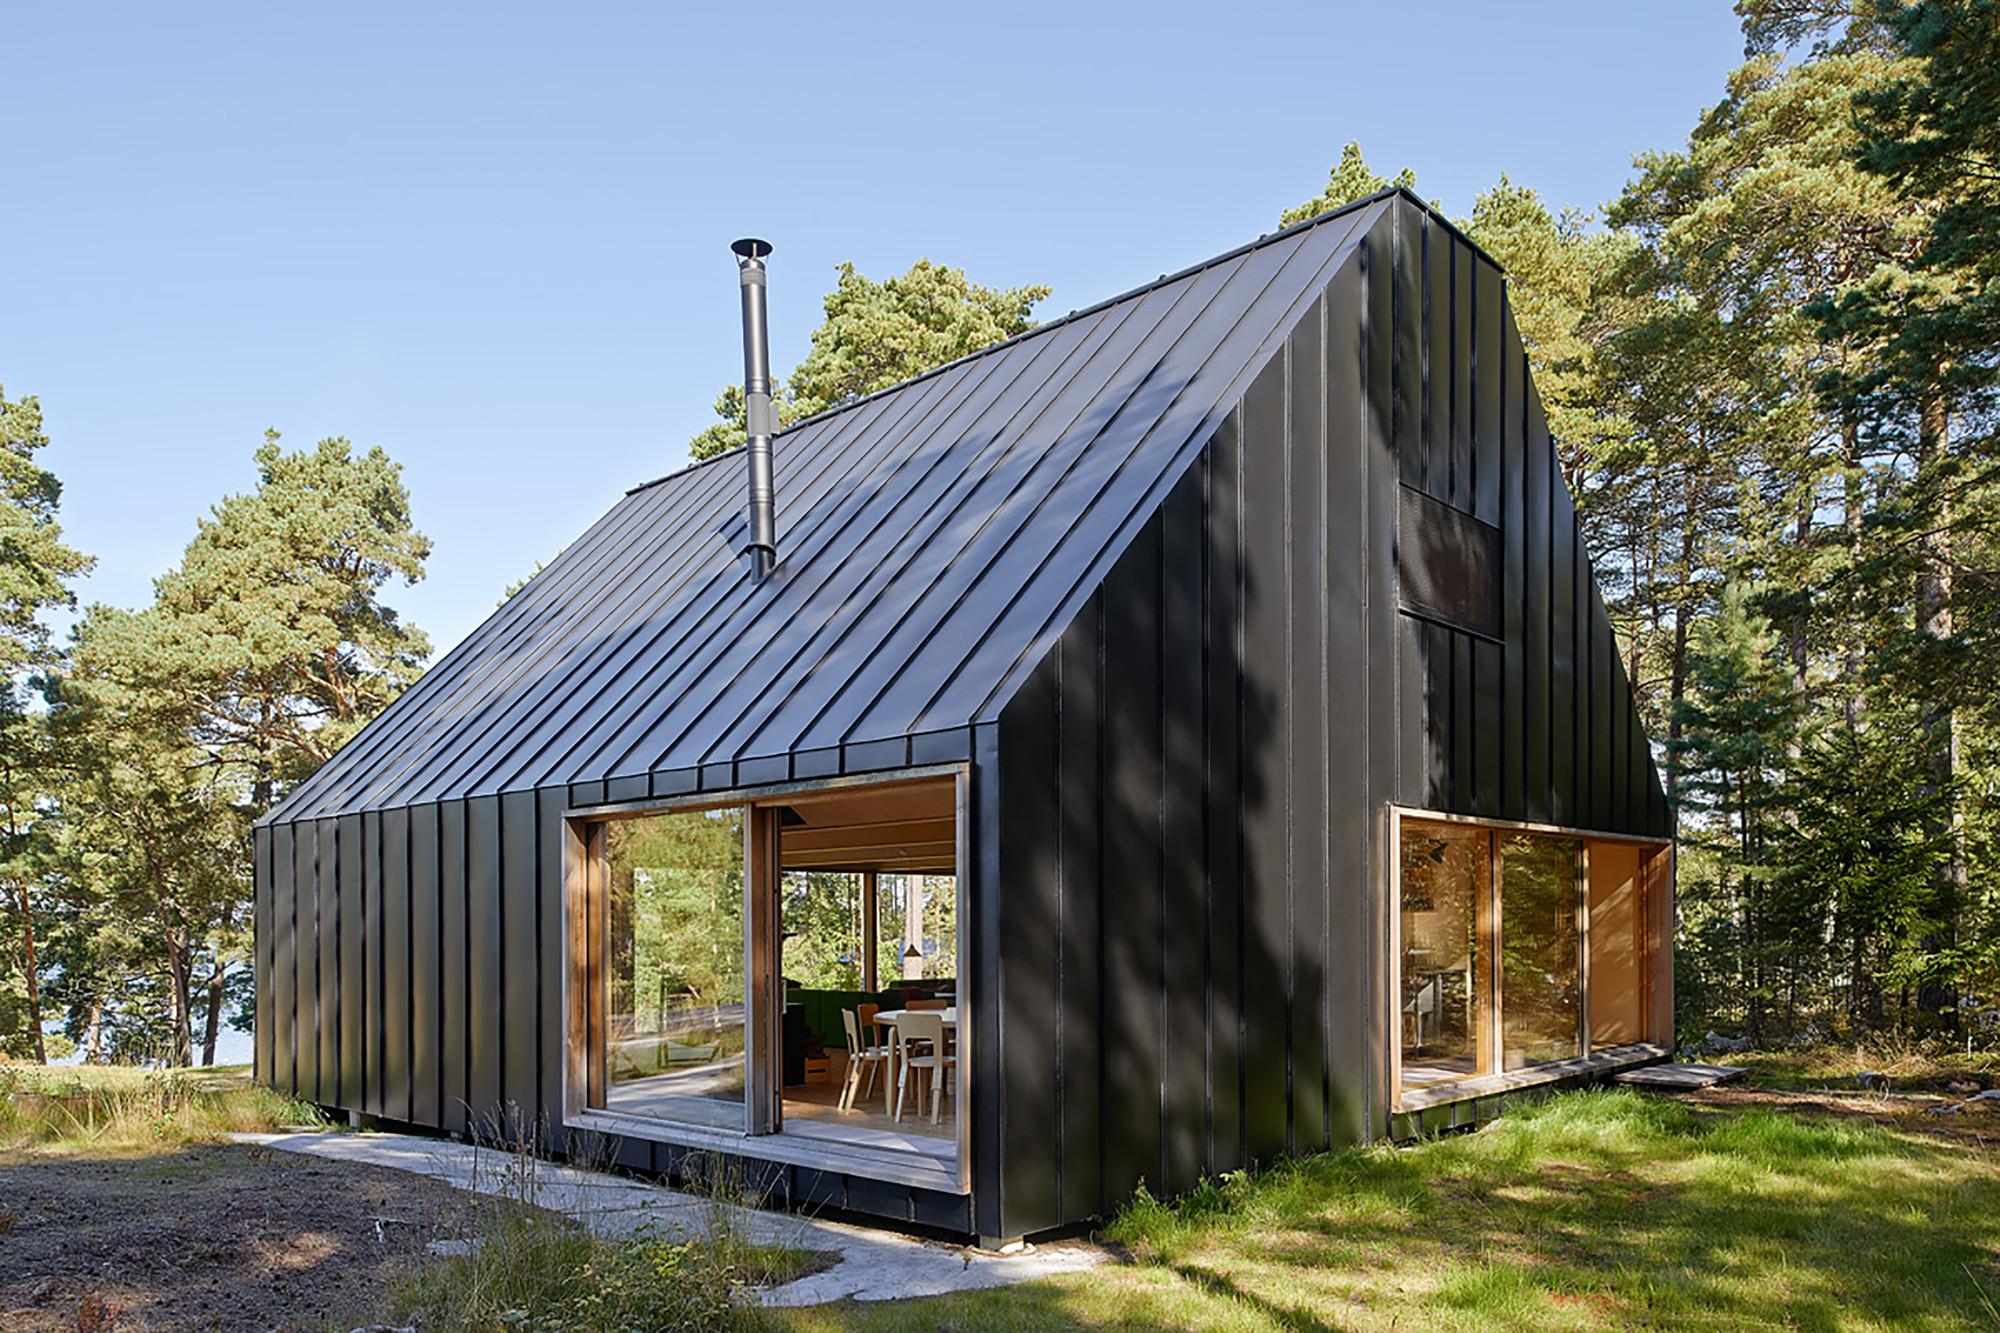 gallery of house husar u00f6    tham  u0026 videg u00e5rd arkitekter